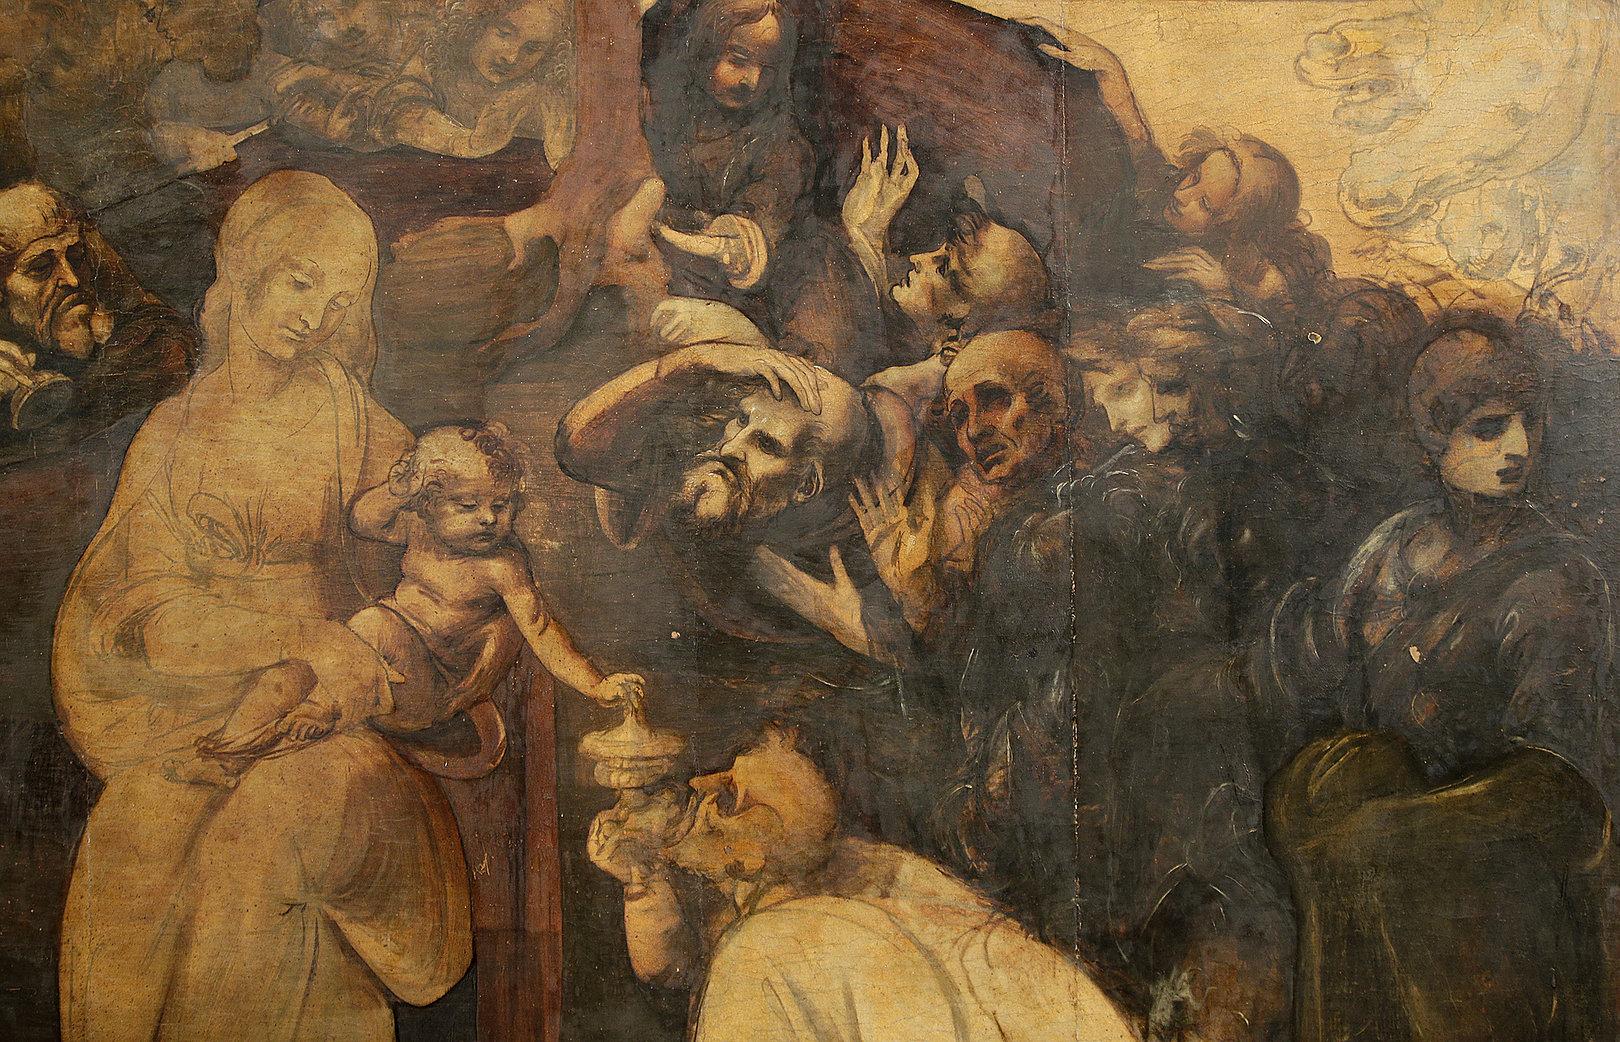 Картинка леонардо да винчи поклонение волхвов